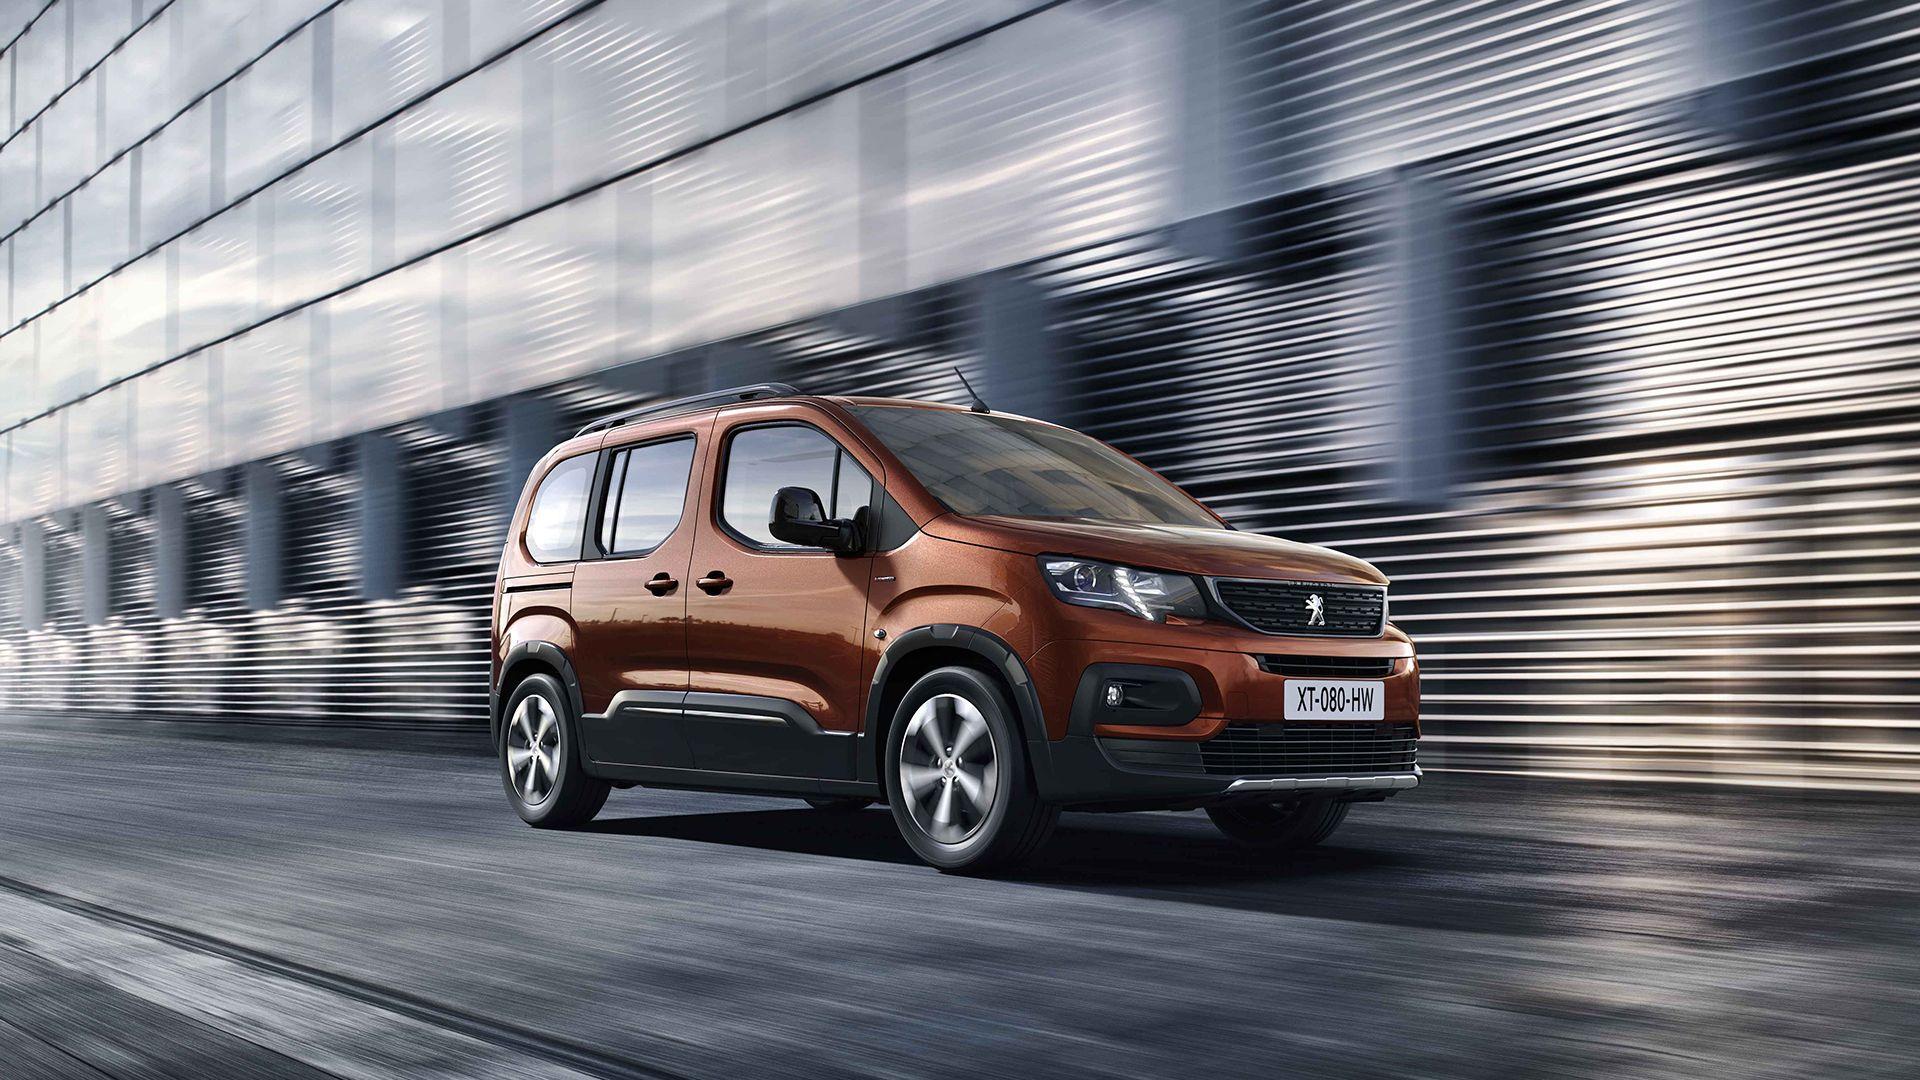 Nuevo Peugeot Rifter, el monovolumen de 7 plazas de Peugeot